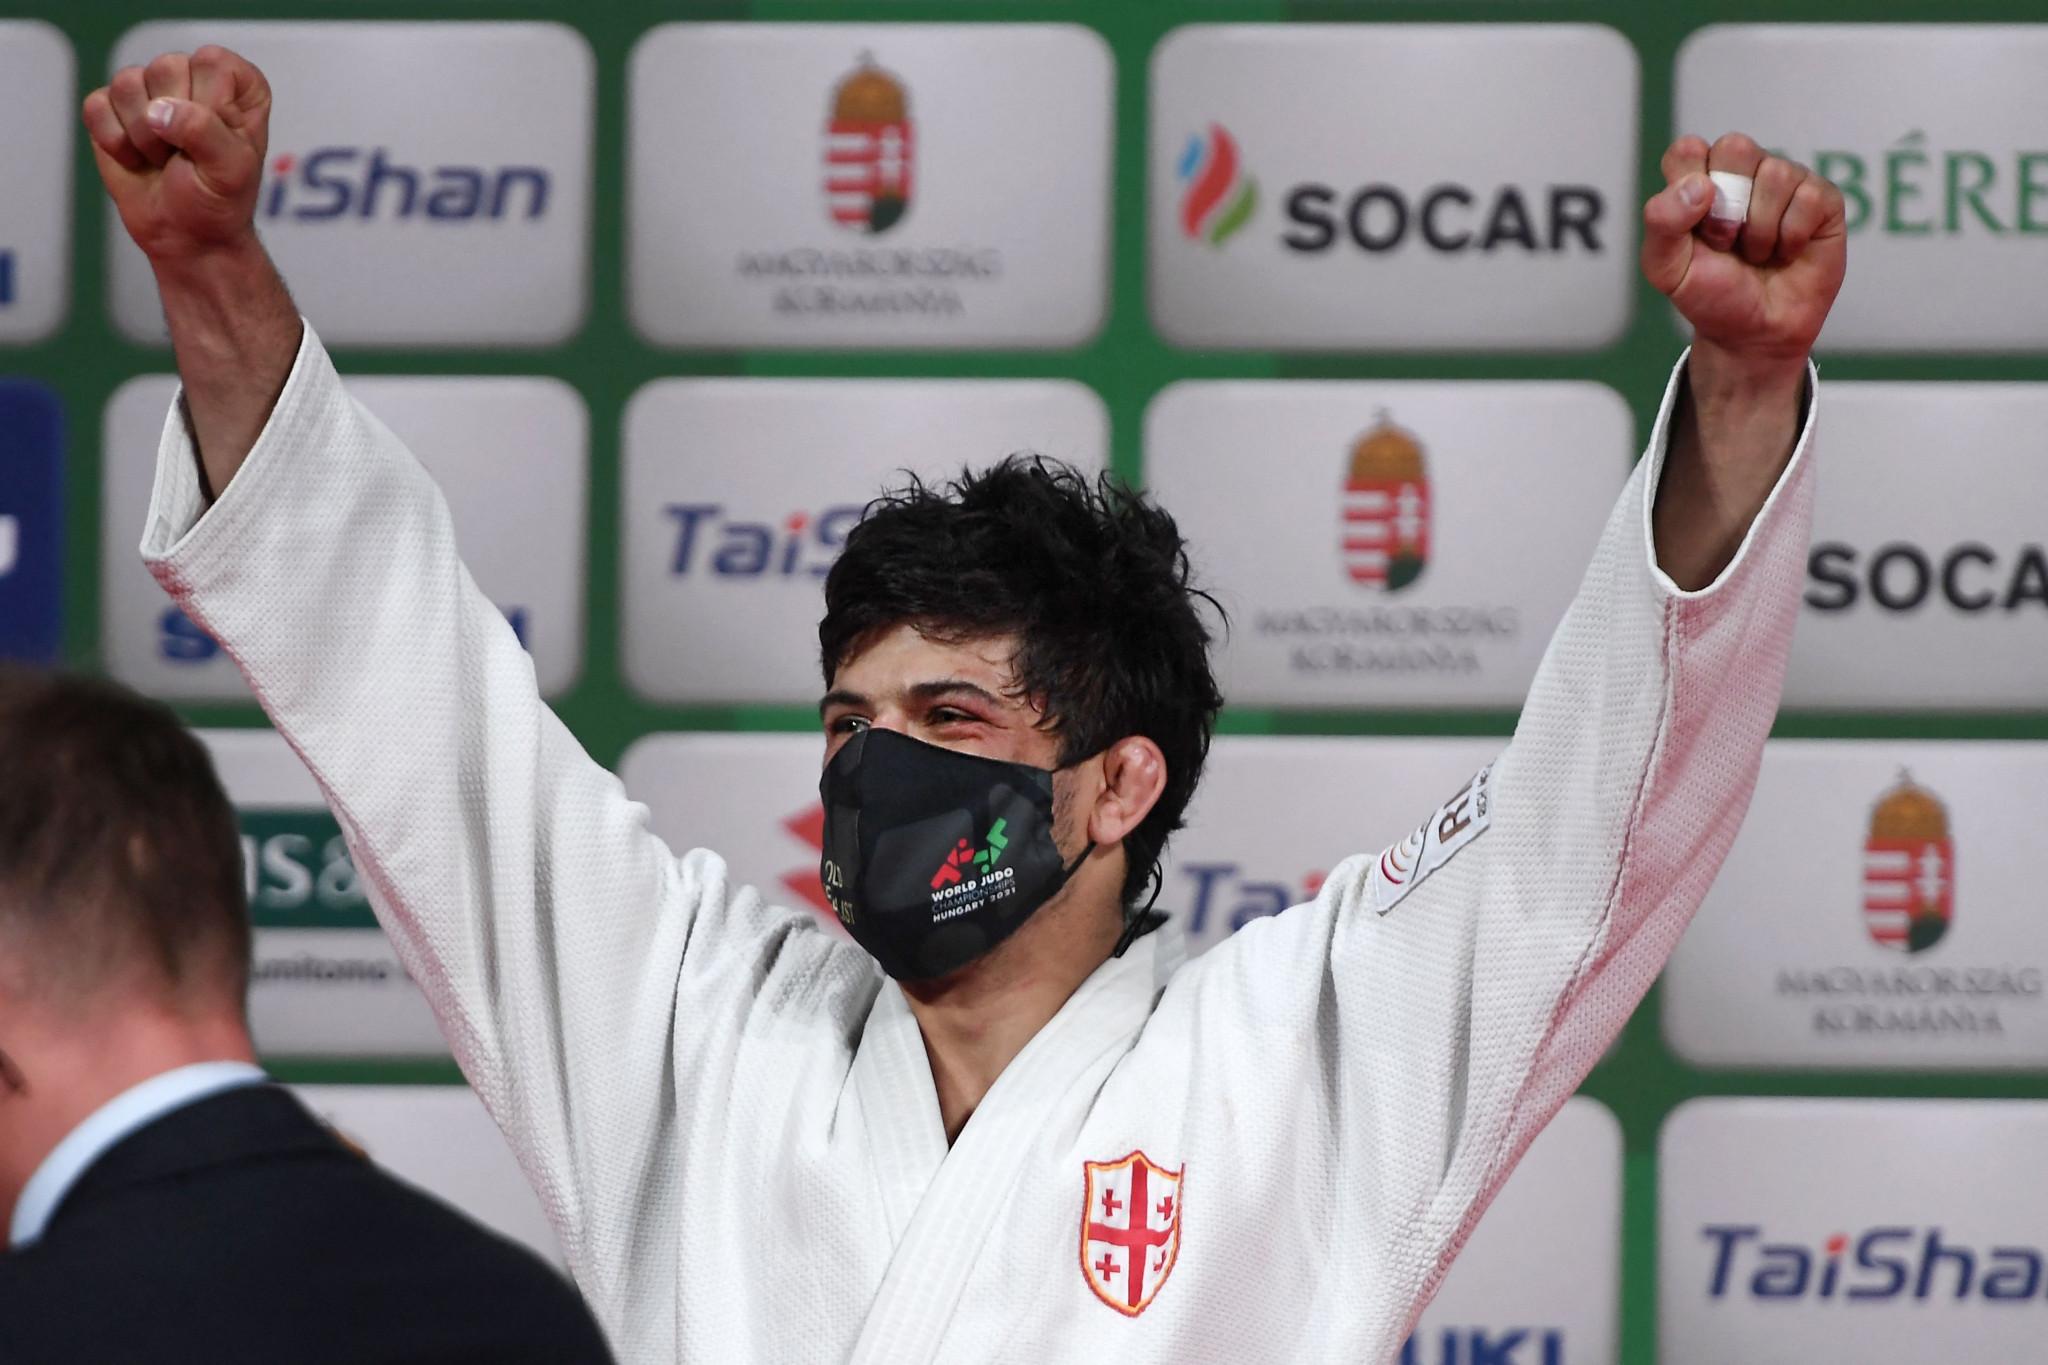 Shavdatuashvili and Klimkait become world judo champions for first time